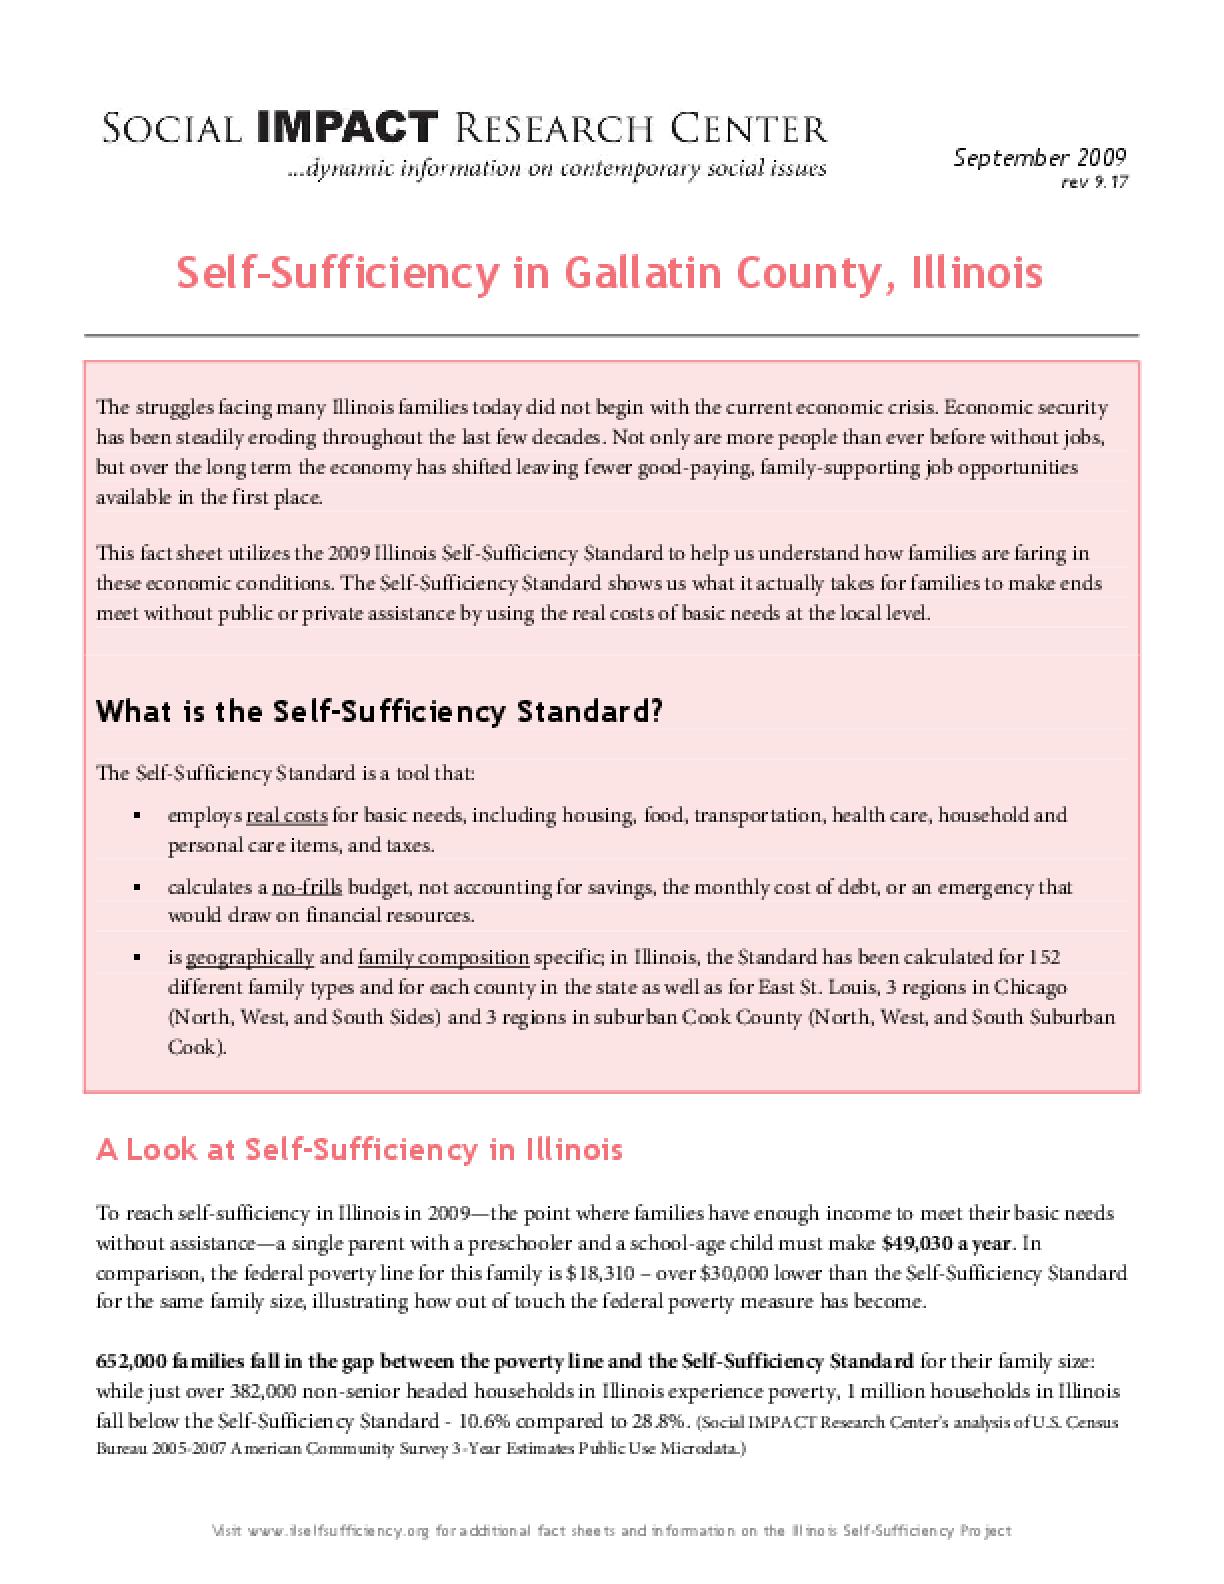 Self-Sufficiency in Gallatin County, Illinois